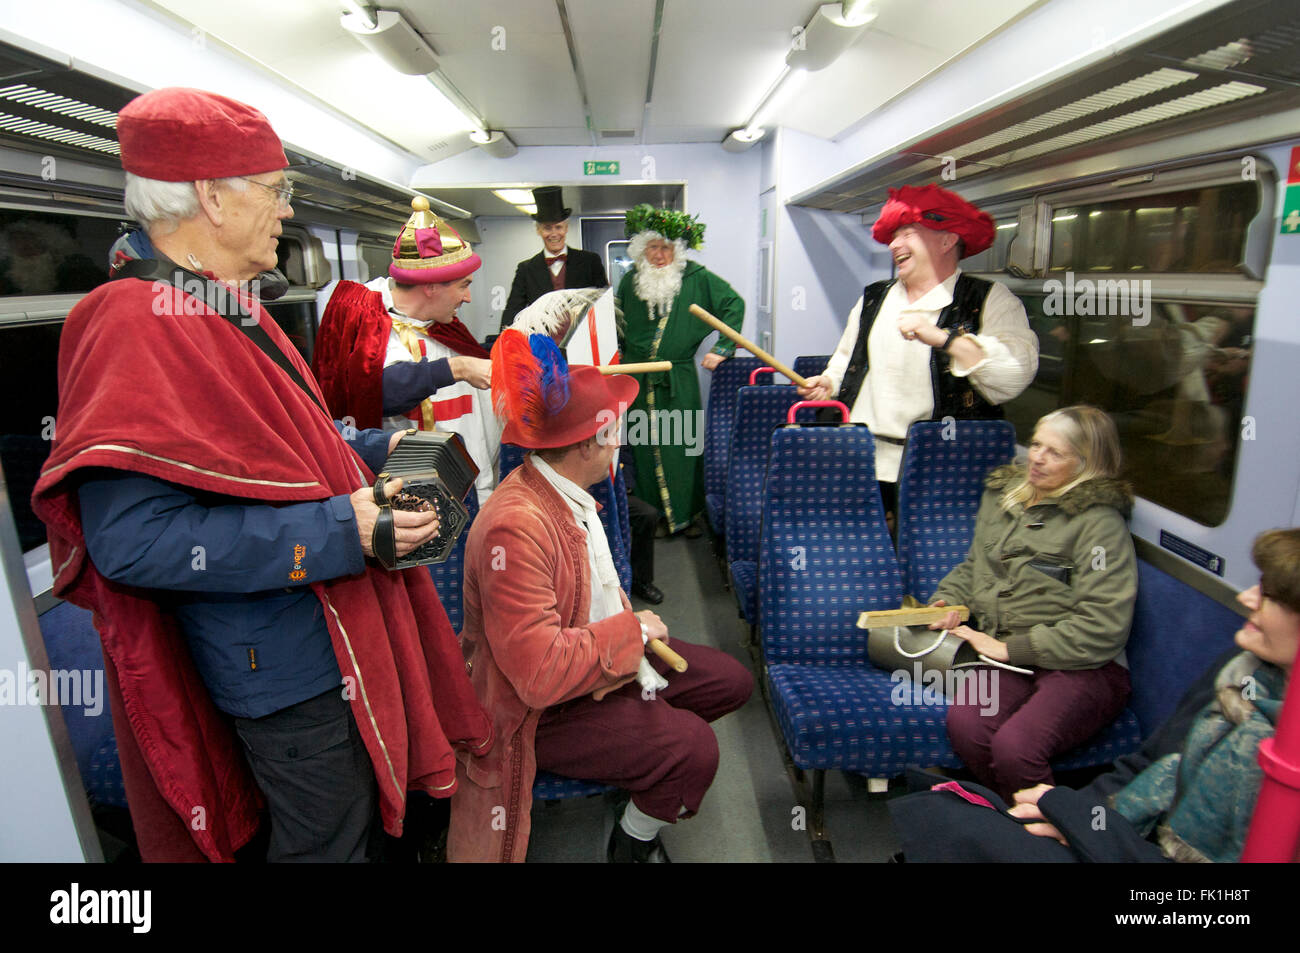 Lympstone Mummers perform on a train, Devon UK - Stock Image